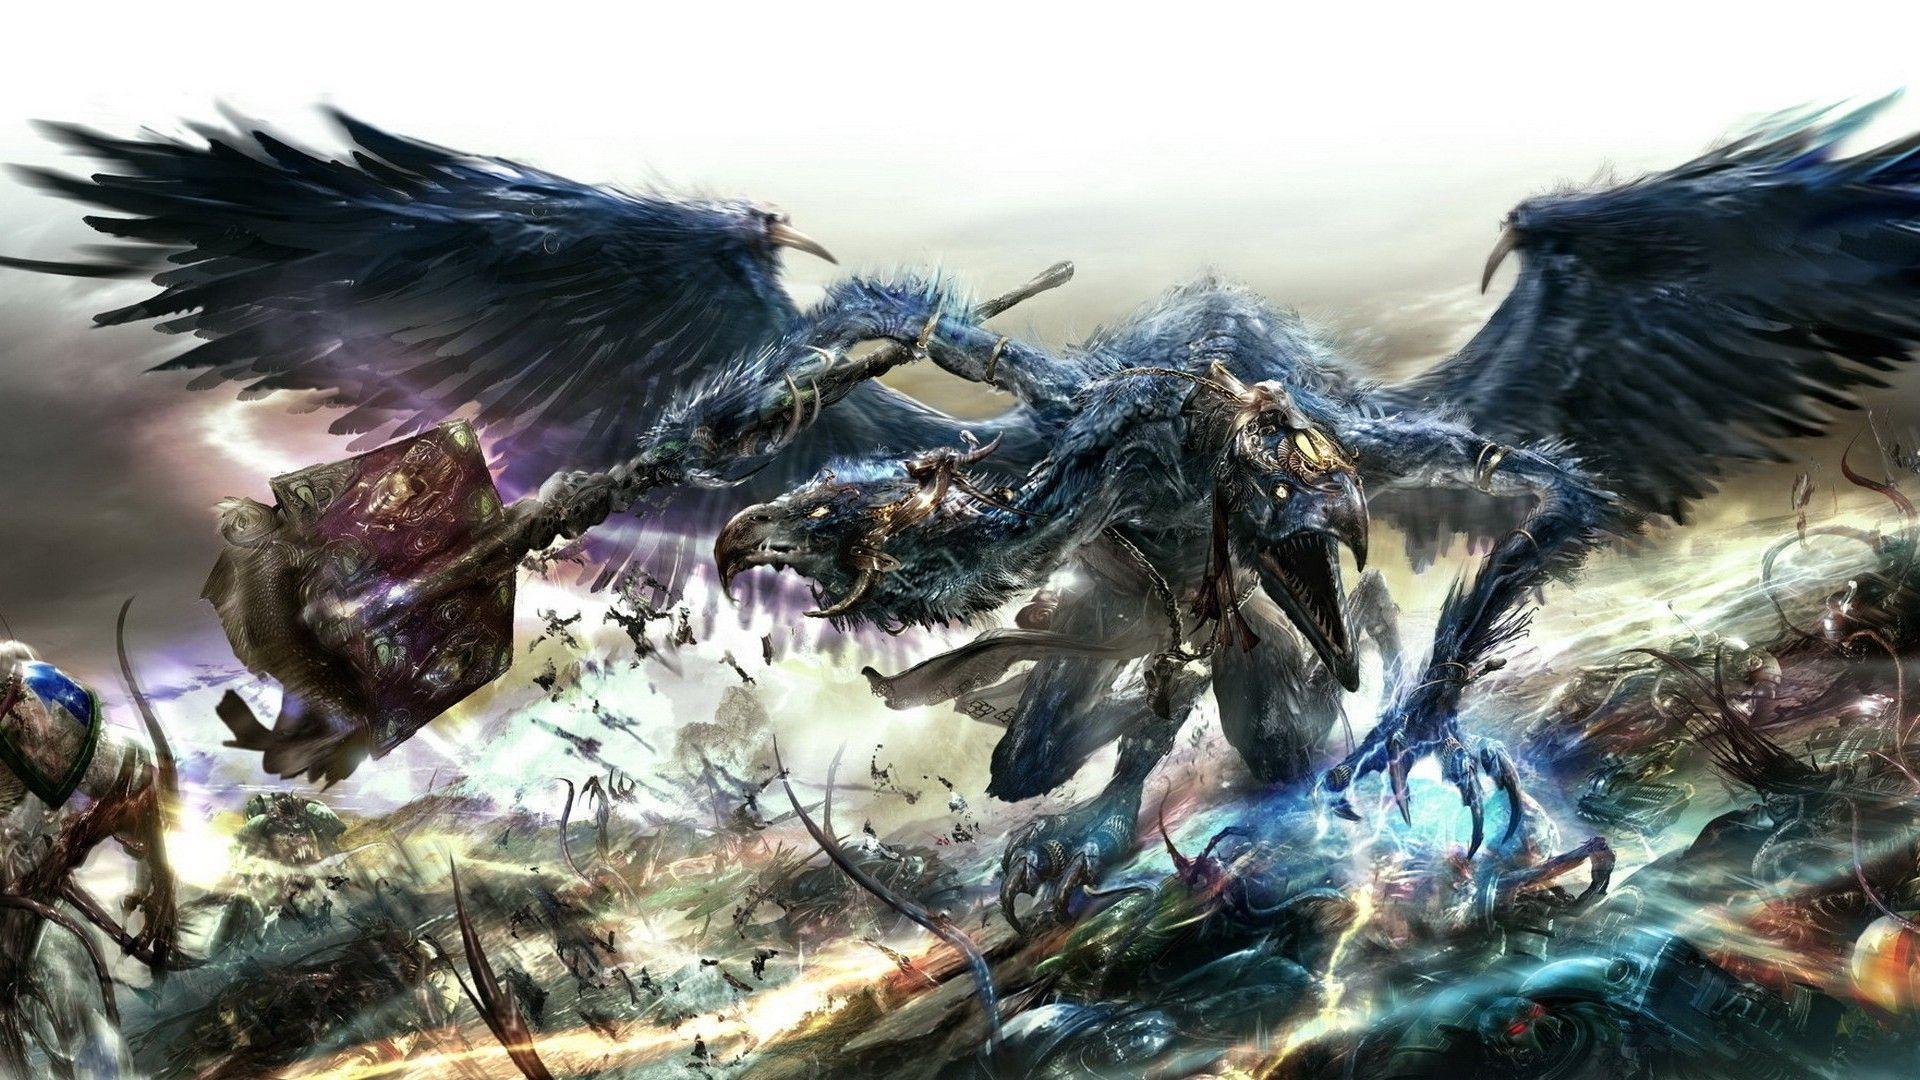 91 Warhammer 40k Wallpapers | Warhammer 40k Backgrounds